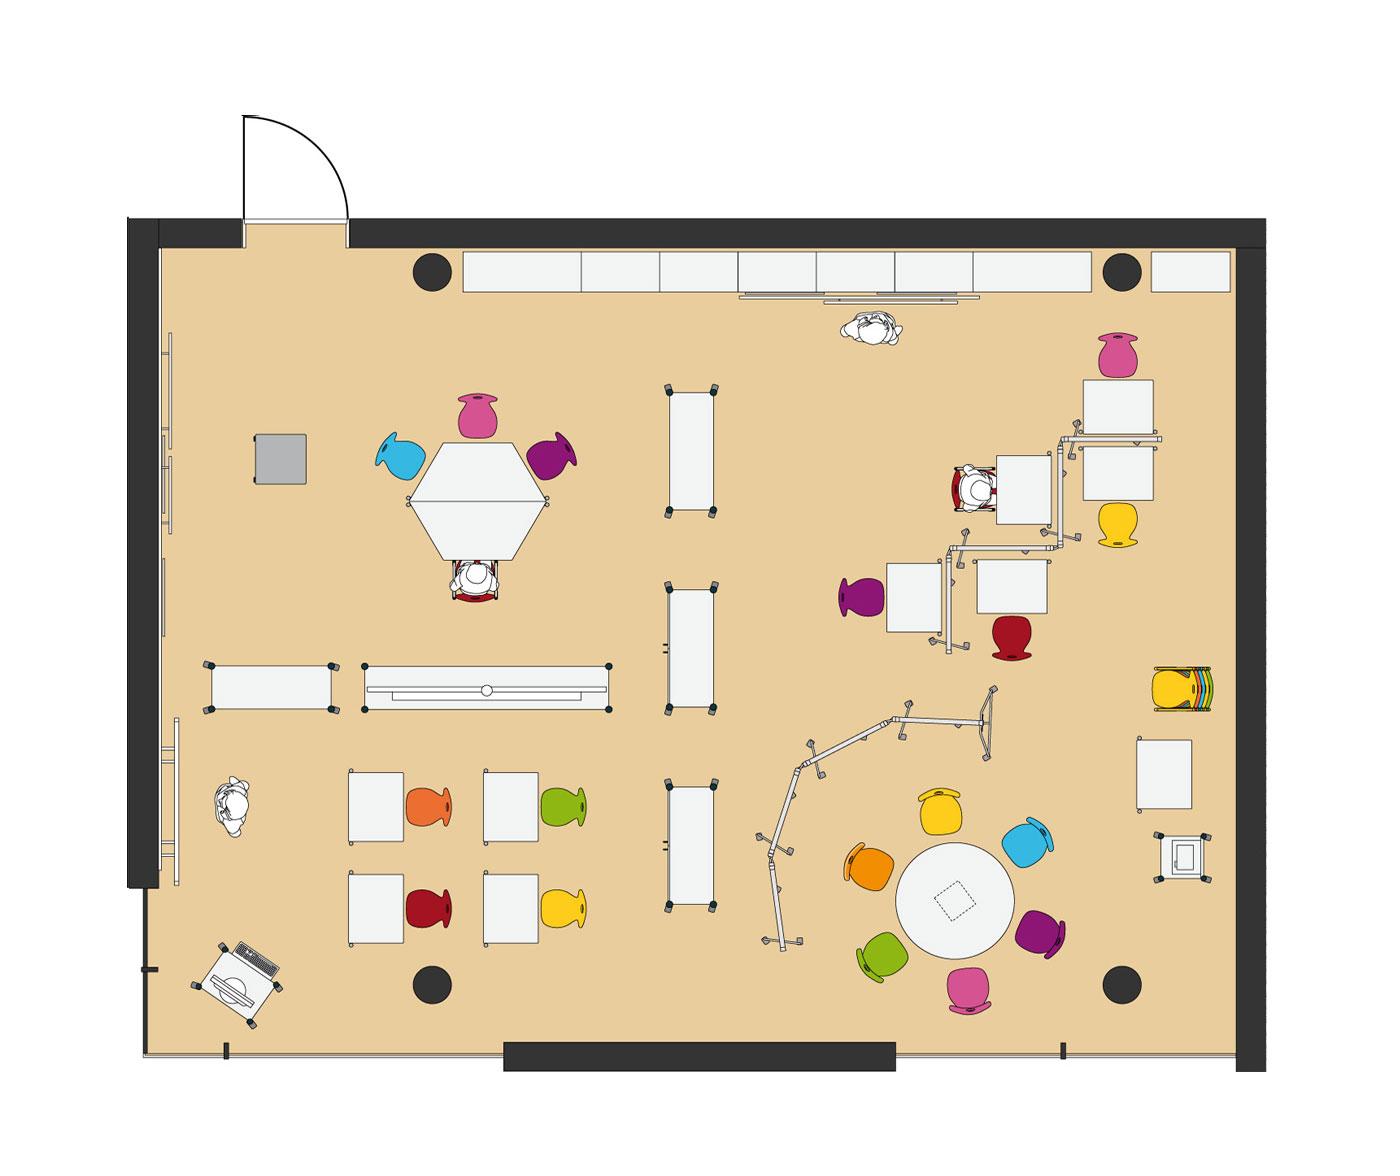 Plan Furniture Layout Vs Ergonomic School Furniture